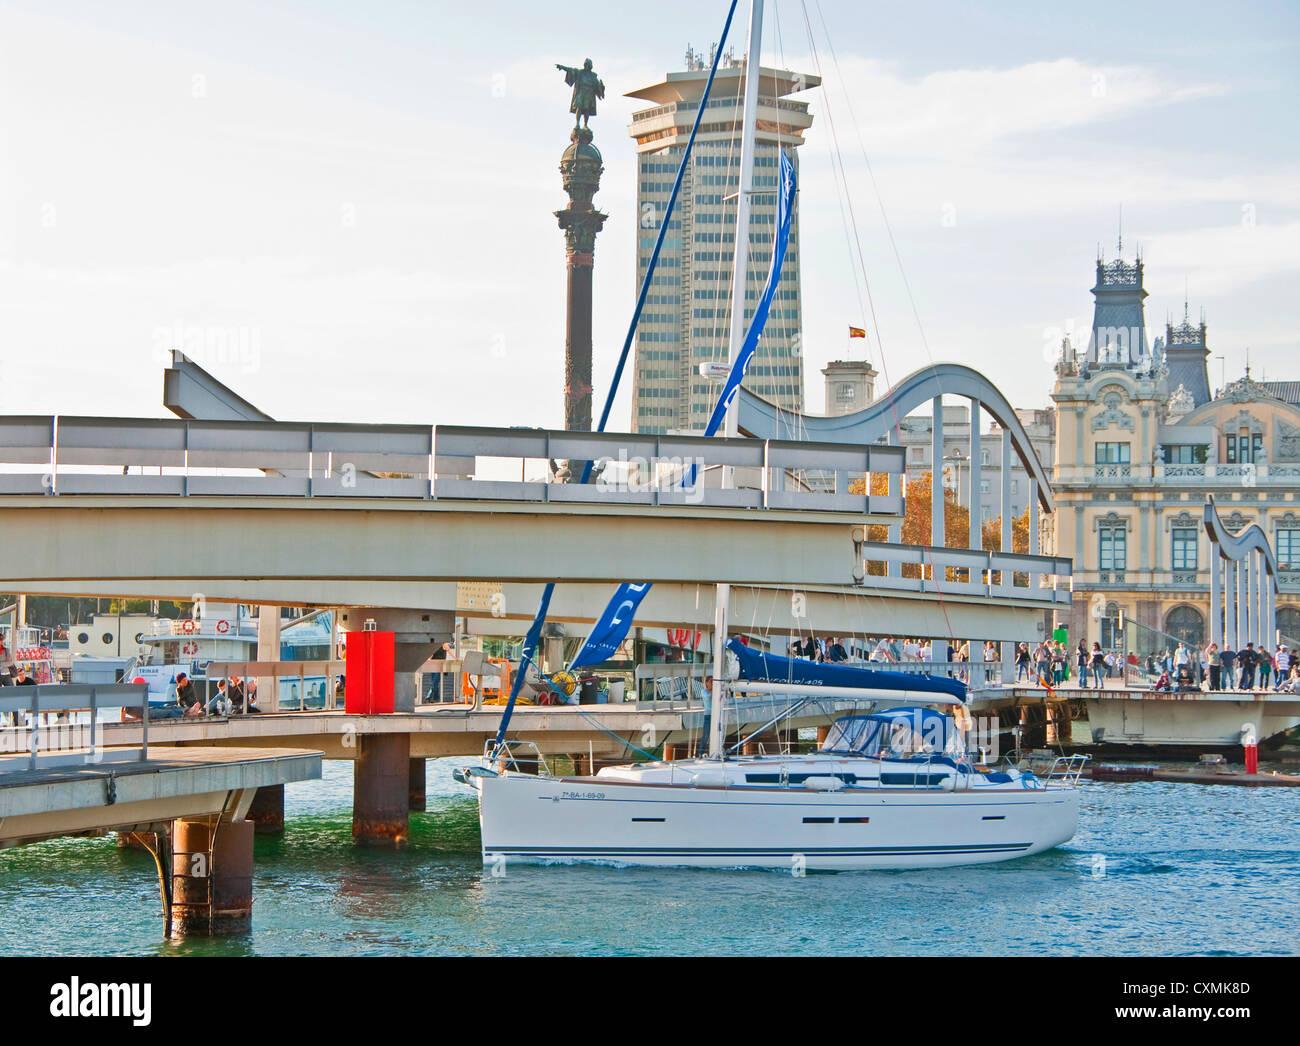 Rambla del Mar pedestrian bridge at Barcelona's Port Vell opening for sailboat to leave Darsena Nacional marina - Stock Image